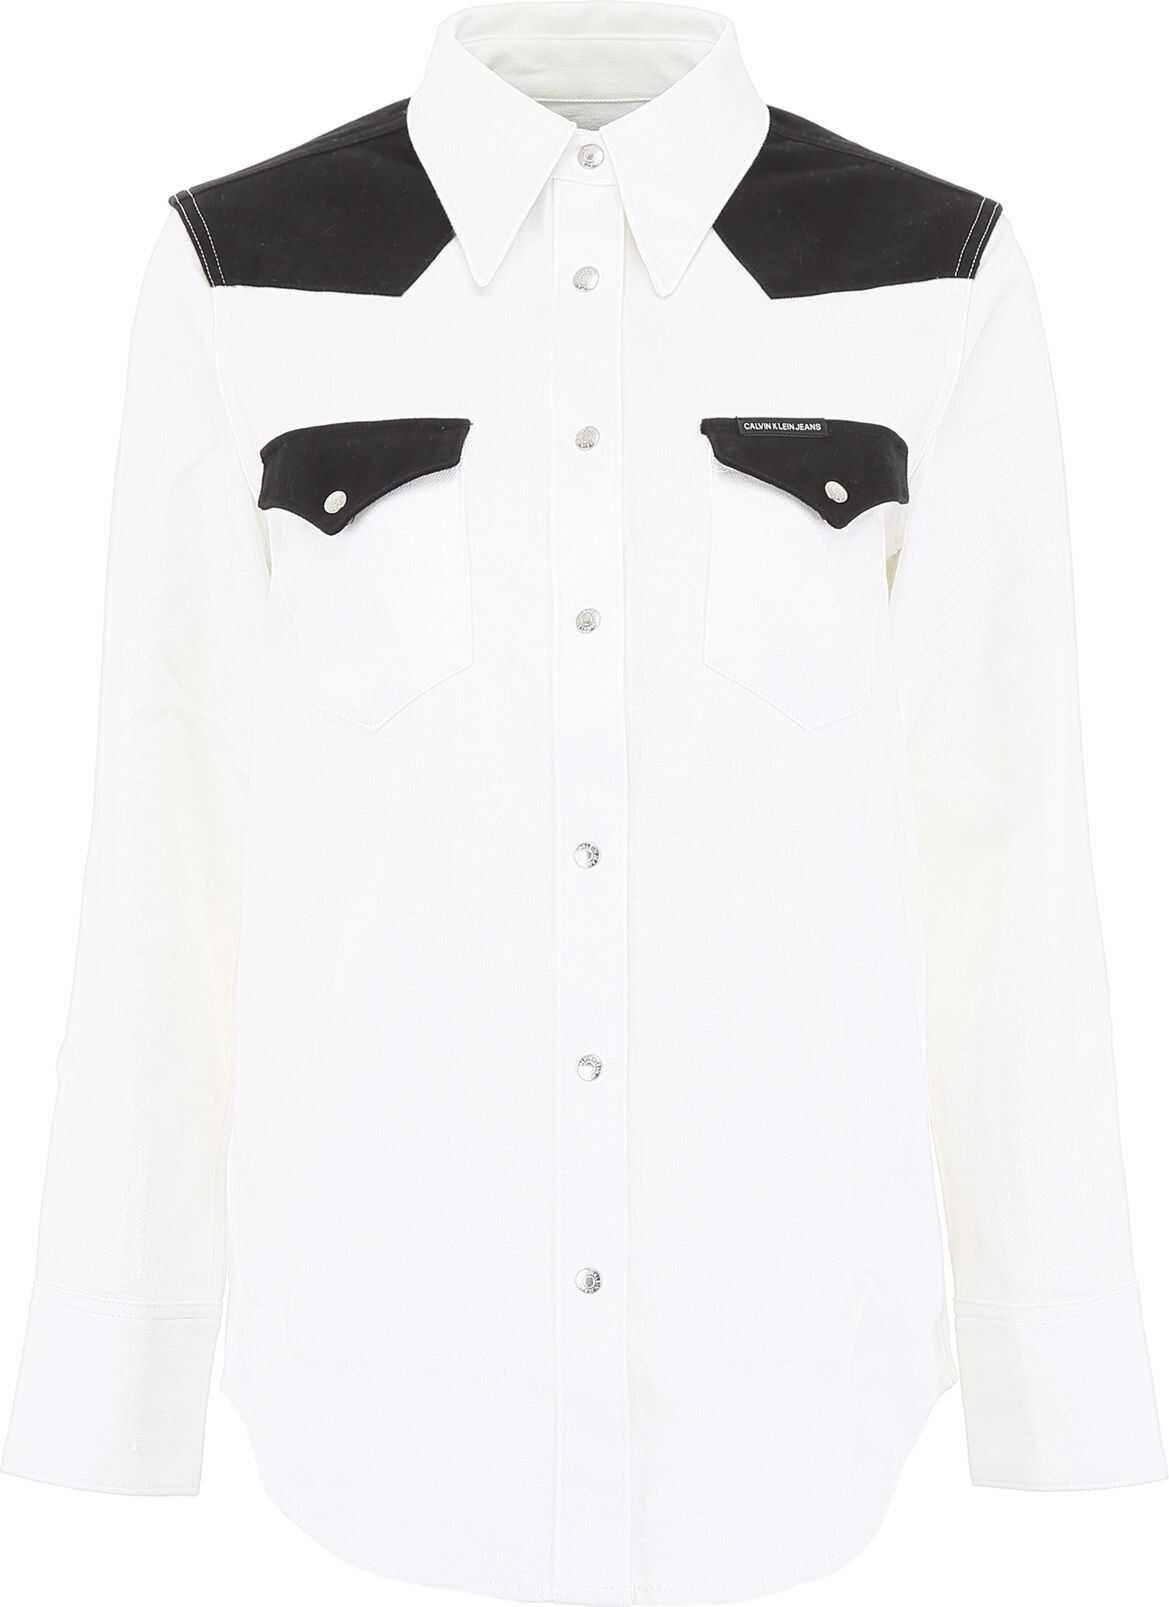 Calvin Klein Jeans Bicolor Cotton Shirt WHITE BLACK